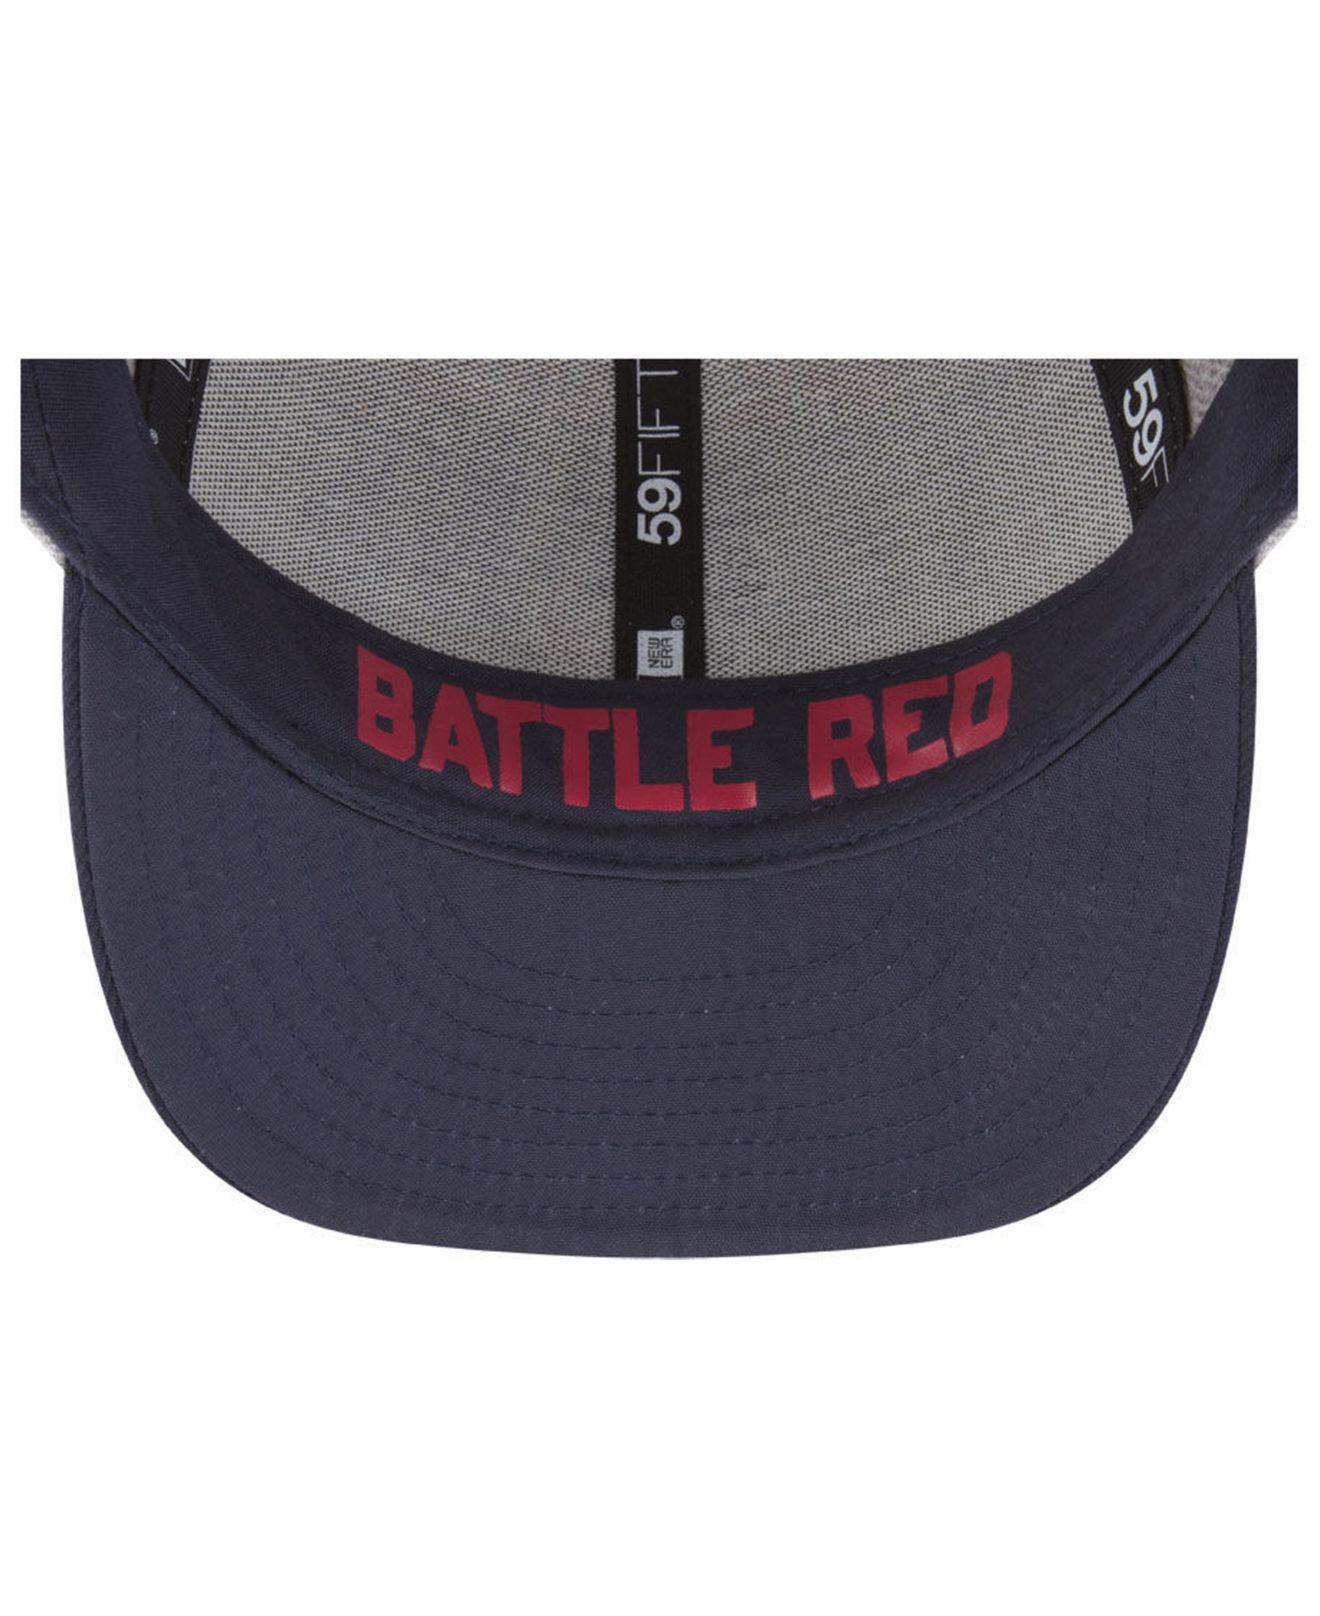 f460fdadb9a1fa Houston Texans Fitted Hats